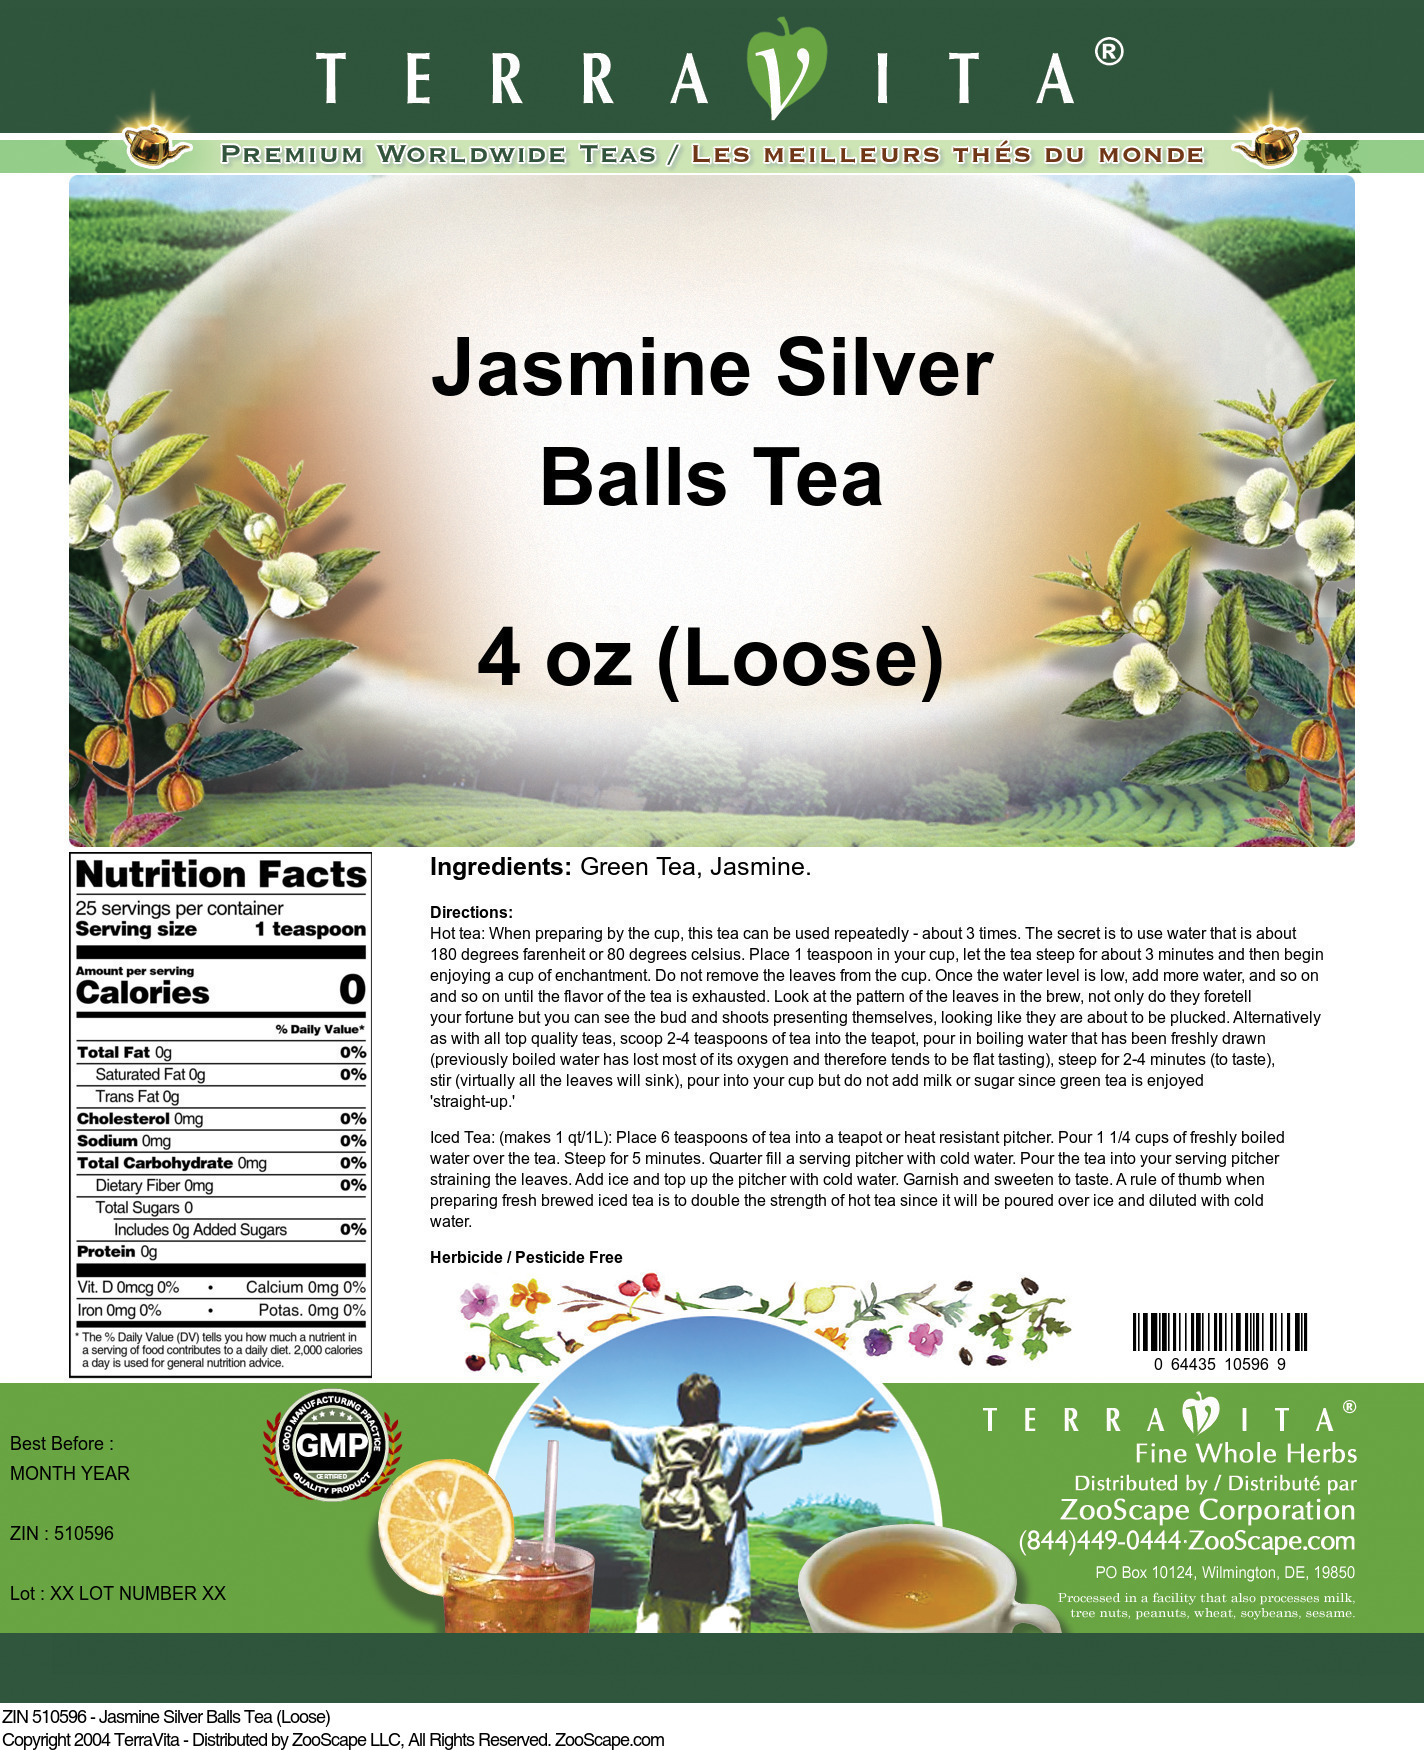 Jasmine Silver Balls